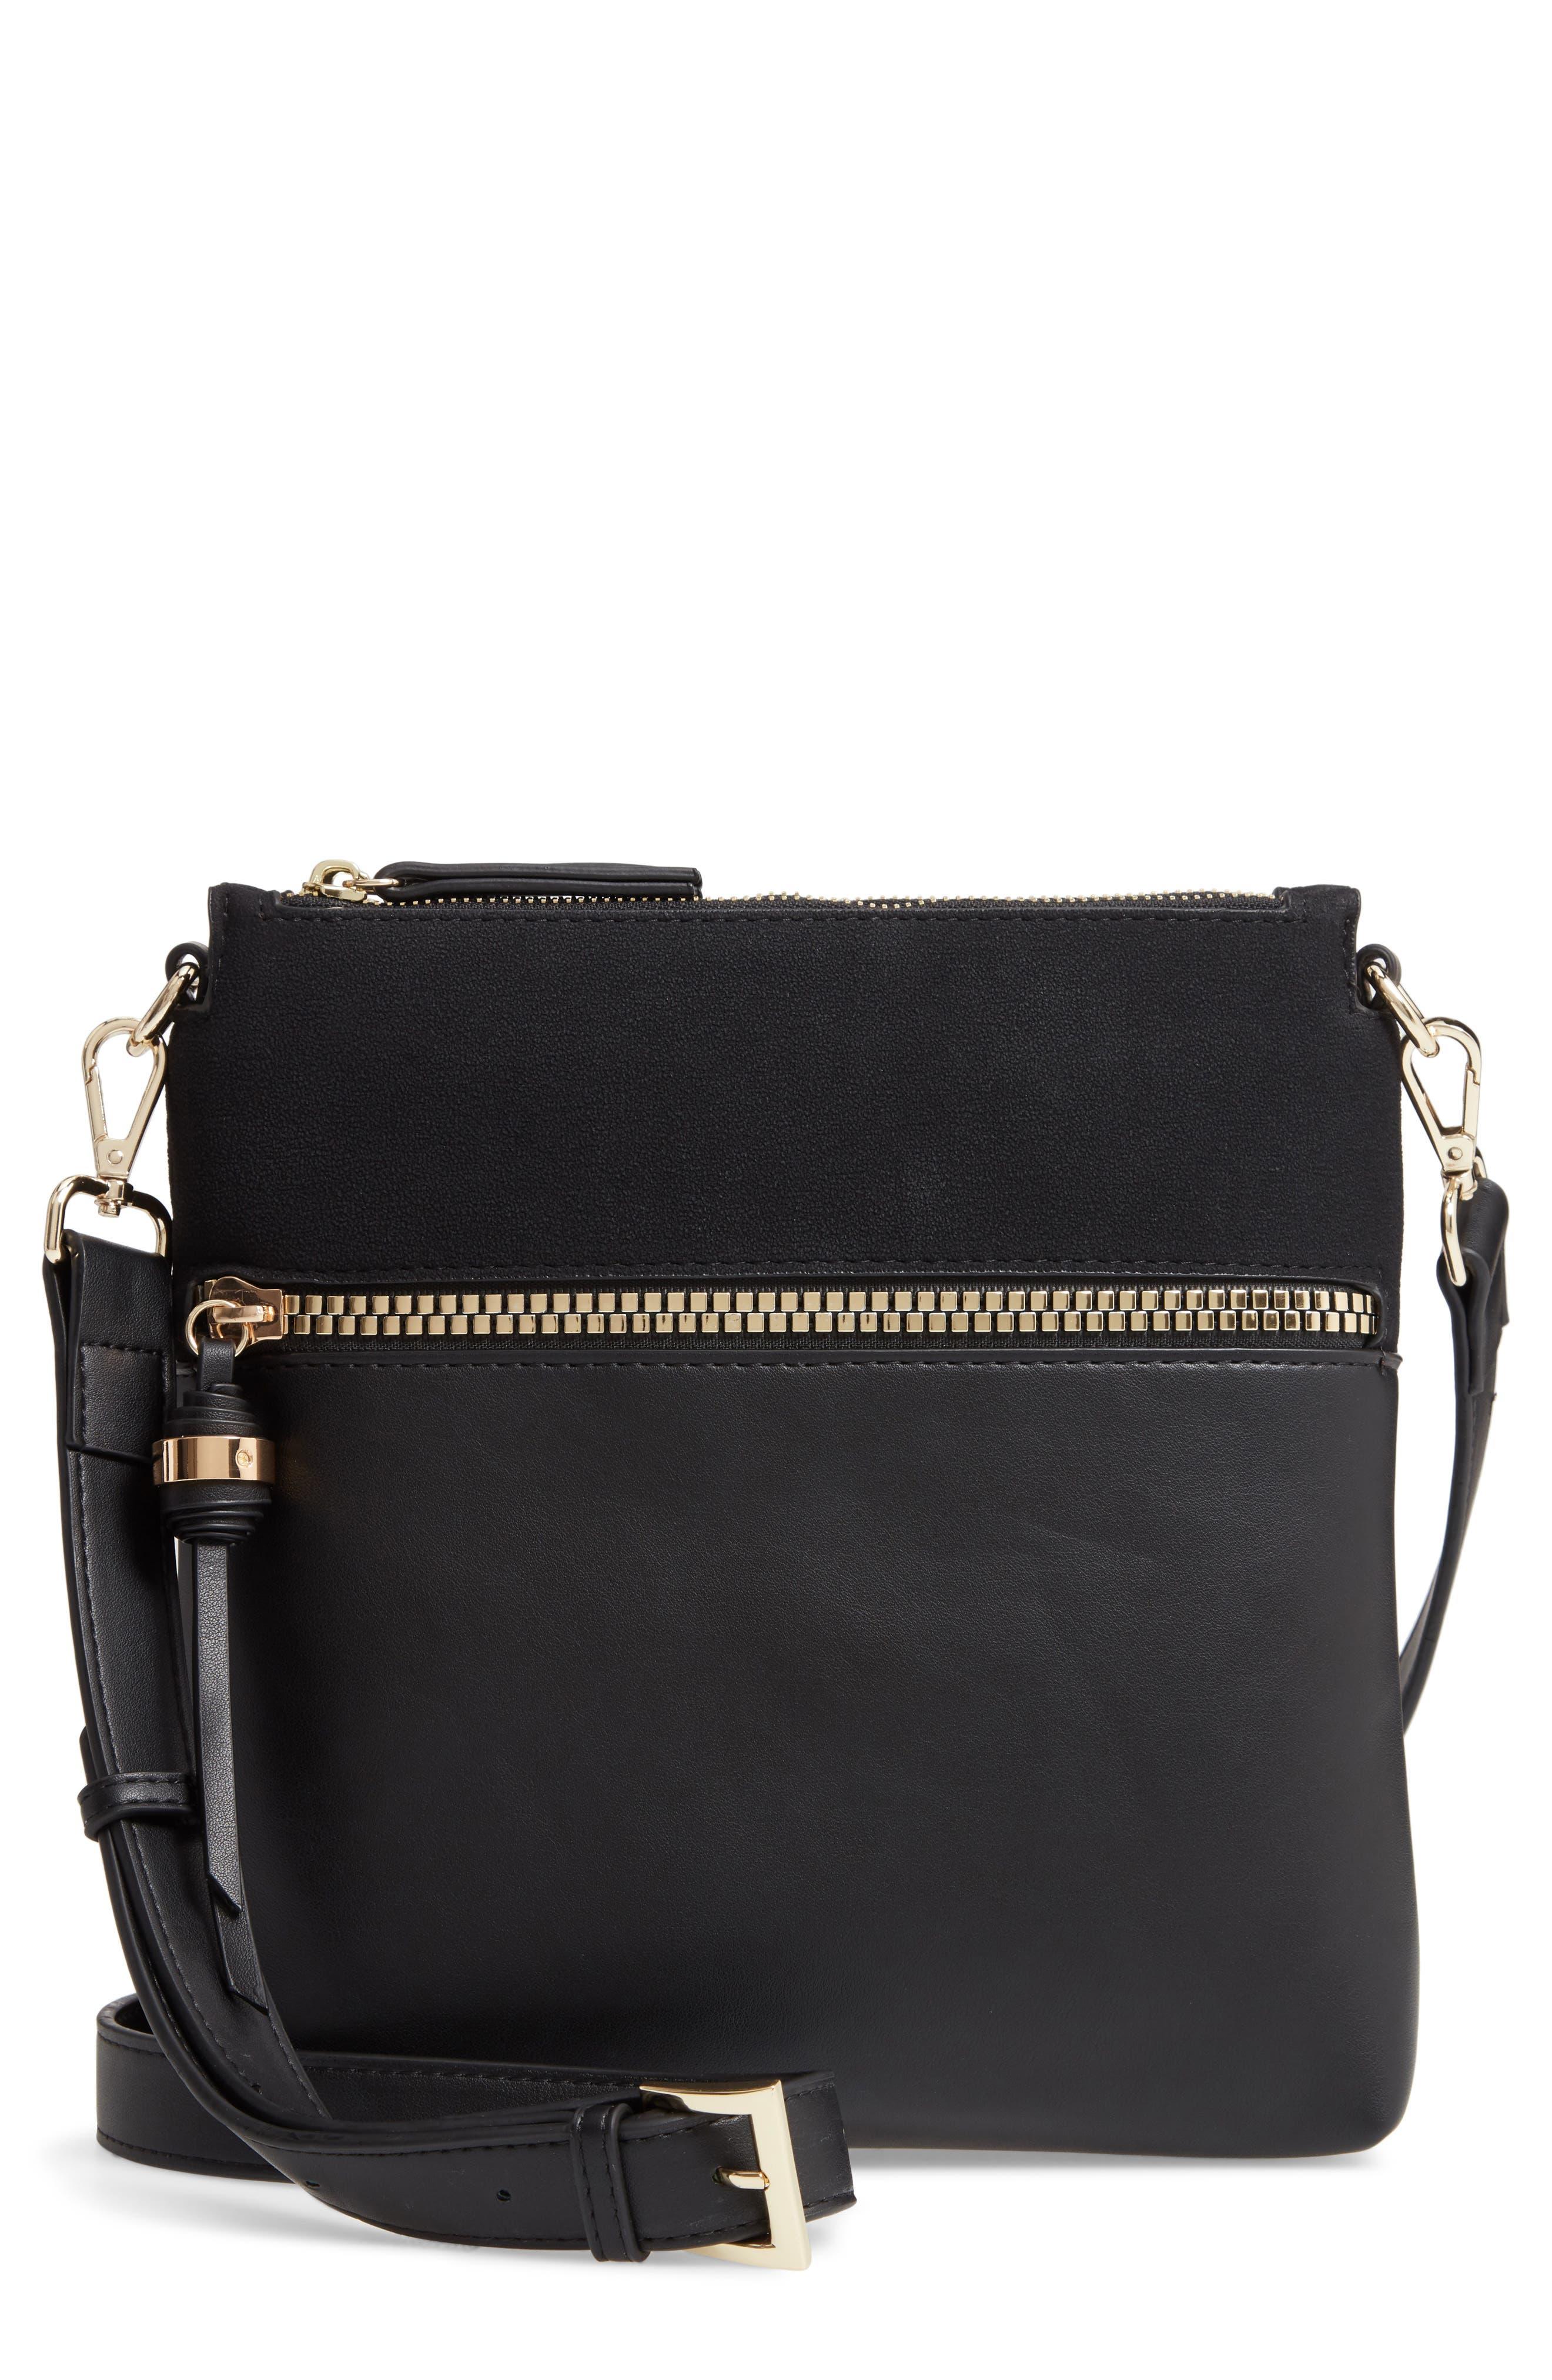 SONDRA ROBERTS Faux Leather Crossbody Bag - Black